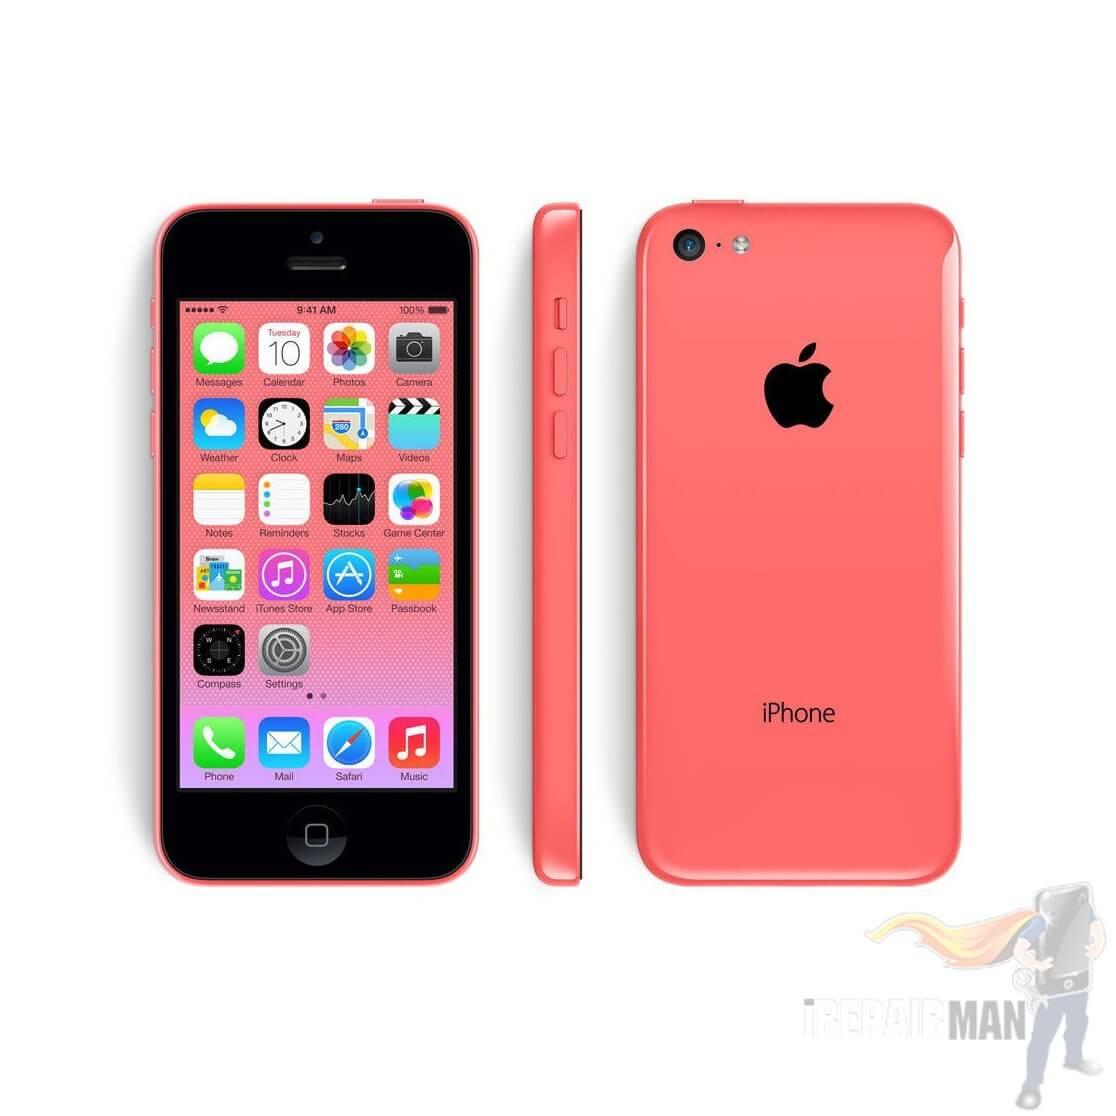 Iphone 5c refurbished review